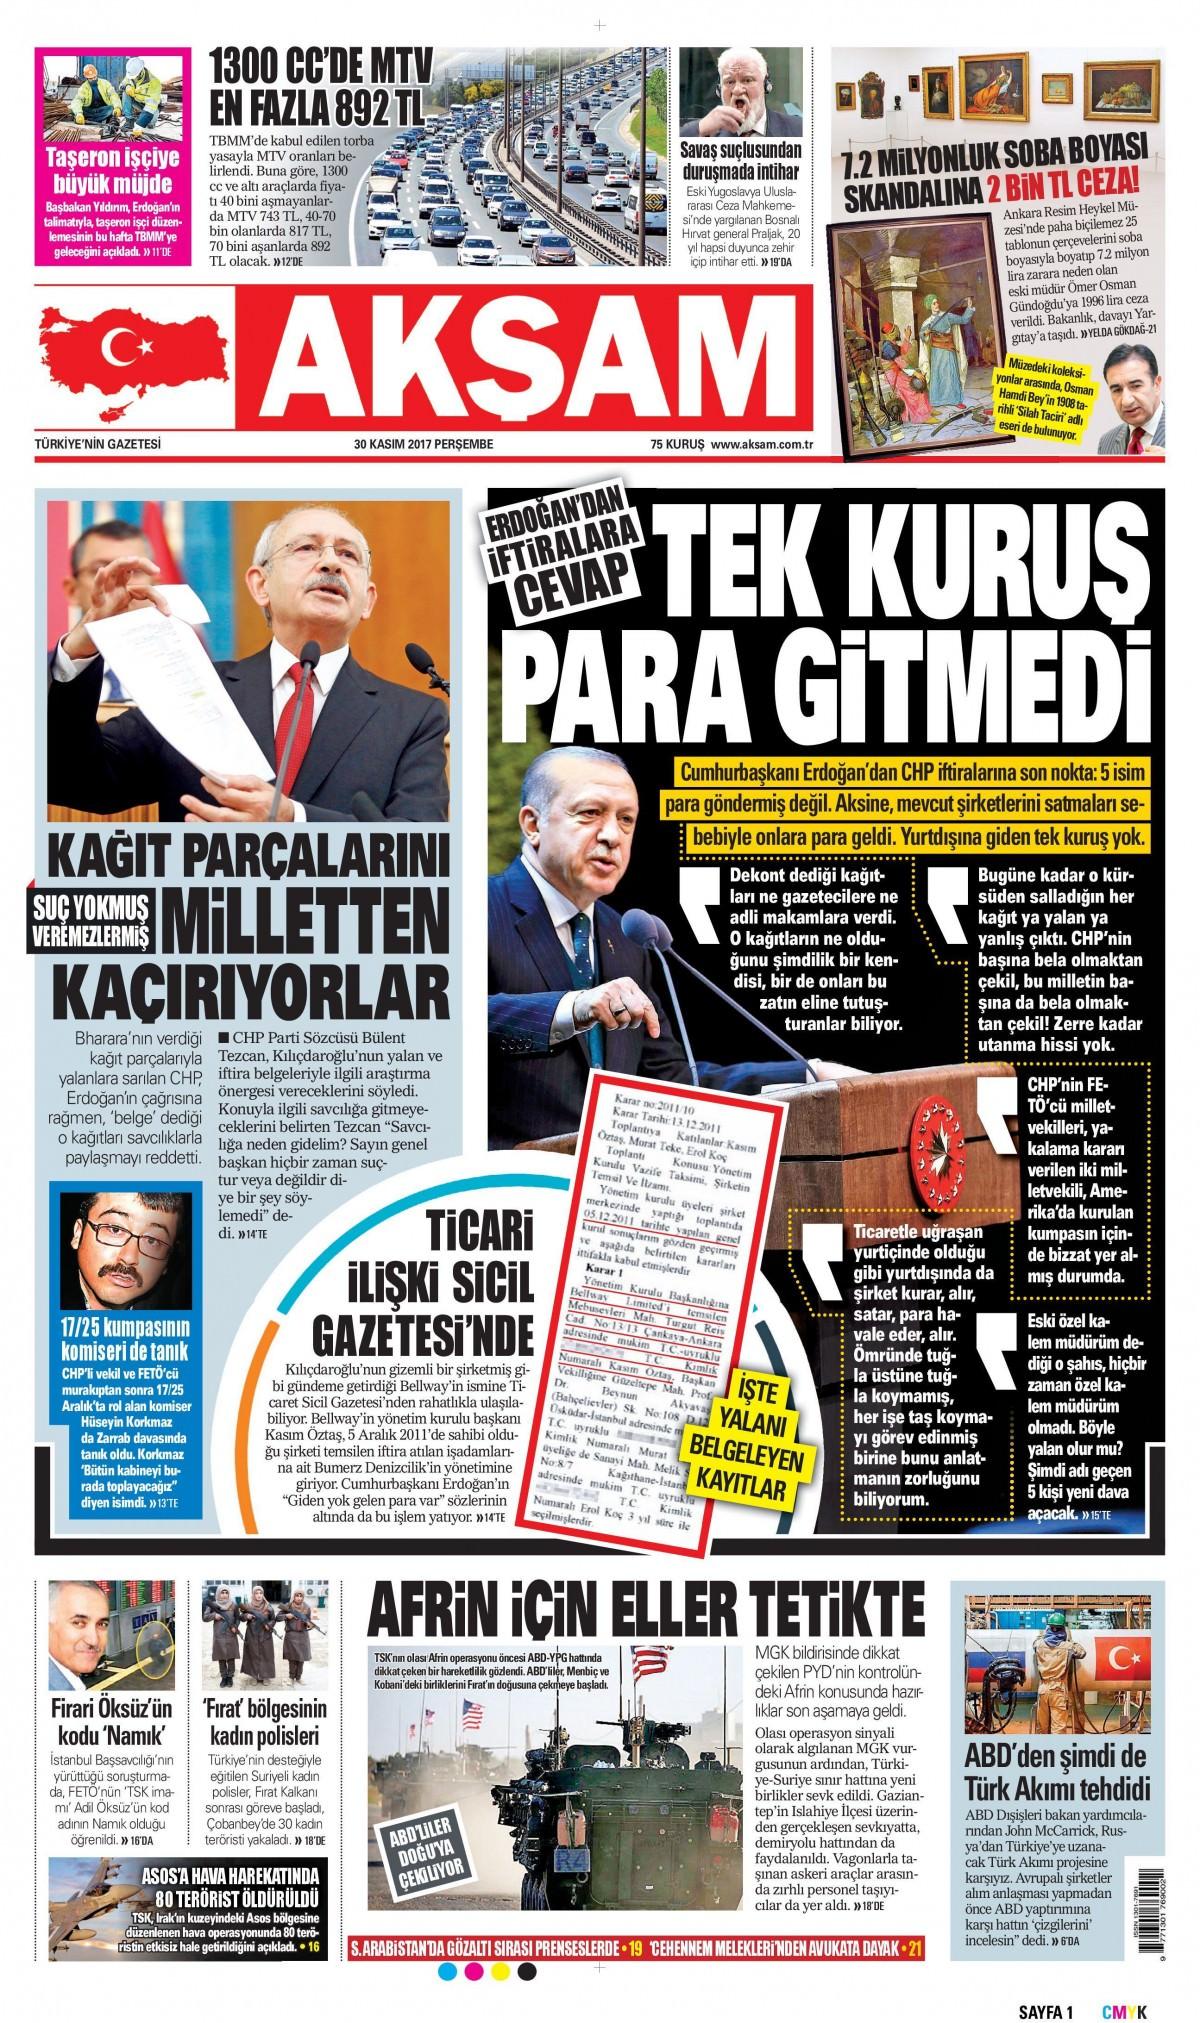 Gazeteler bugün hangi manşeti attı 11